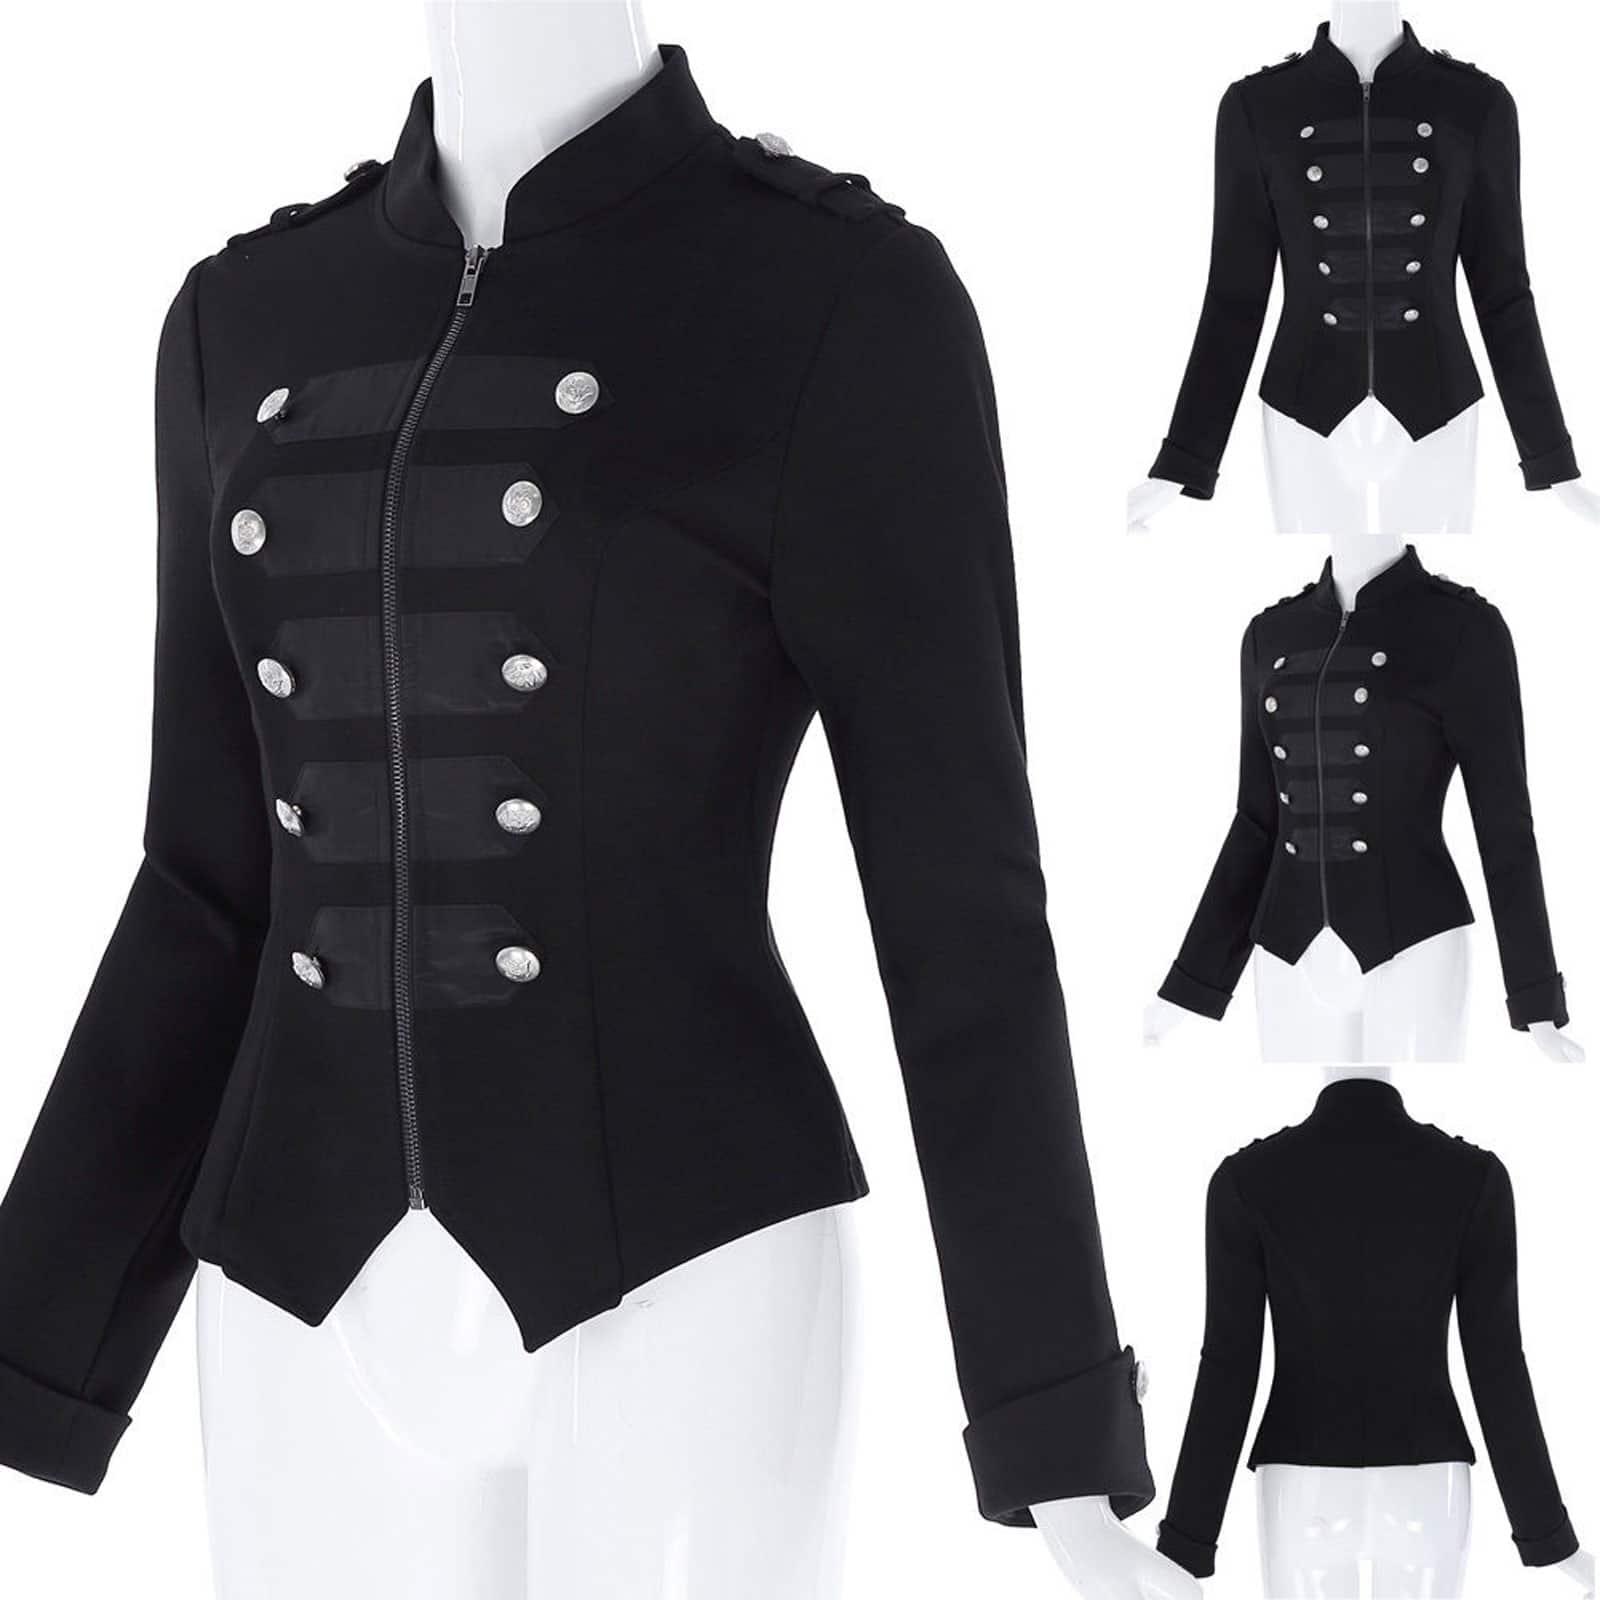 5949d58c60 Steampunk Emo MCR Punk Gothic Military Jacket